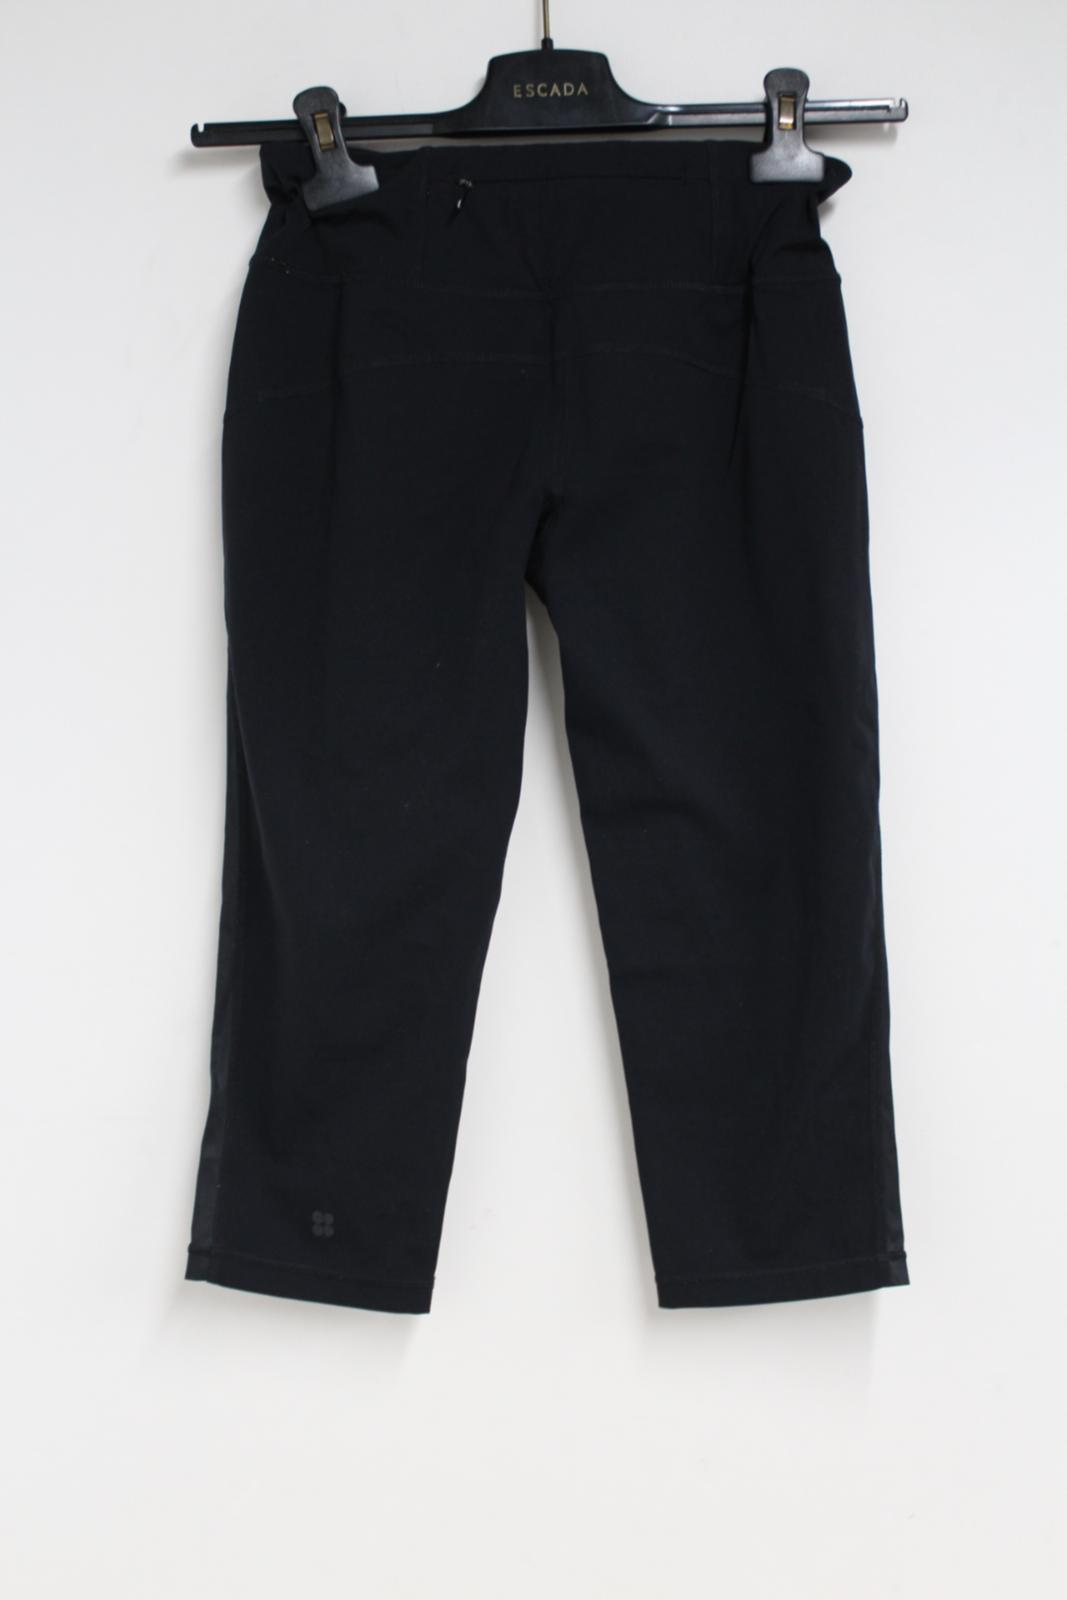 Sweaty-Betty-Ladies-Negro-3-4-piernas-Corto-Leggings-Activewear-pequeno-W26-L16 miniatura 7